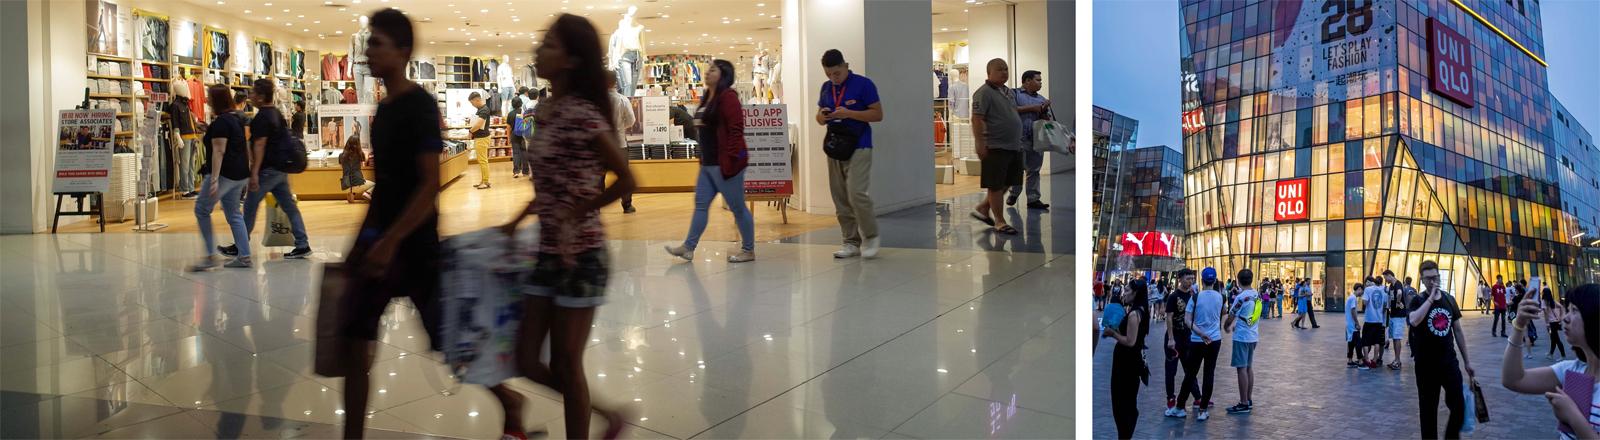 Uniqlo-Shops in Asien